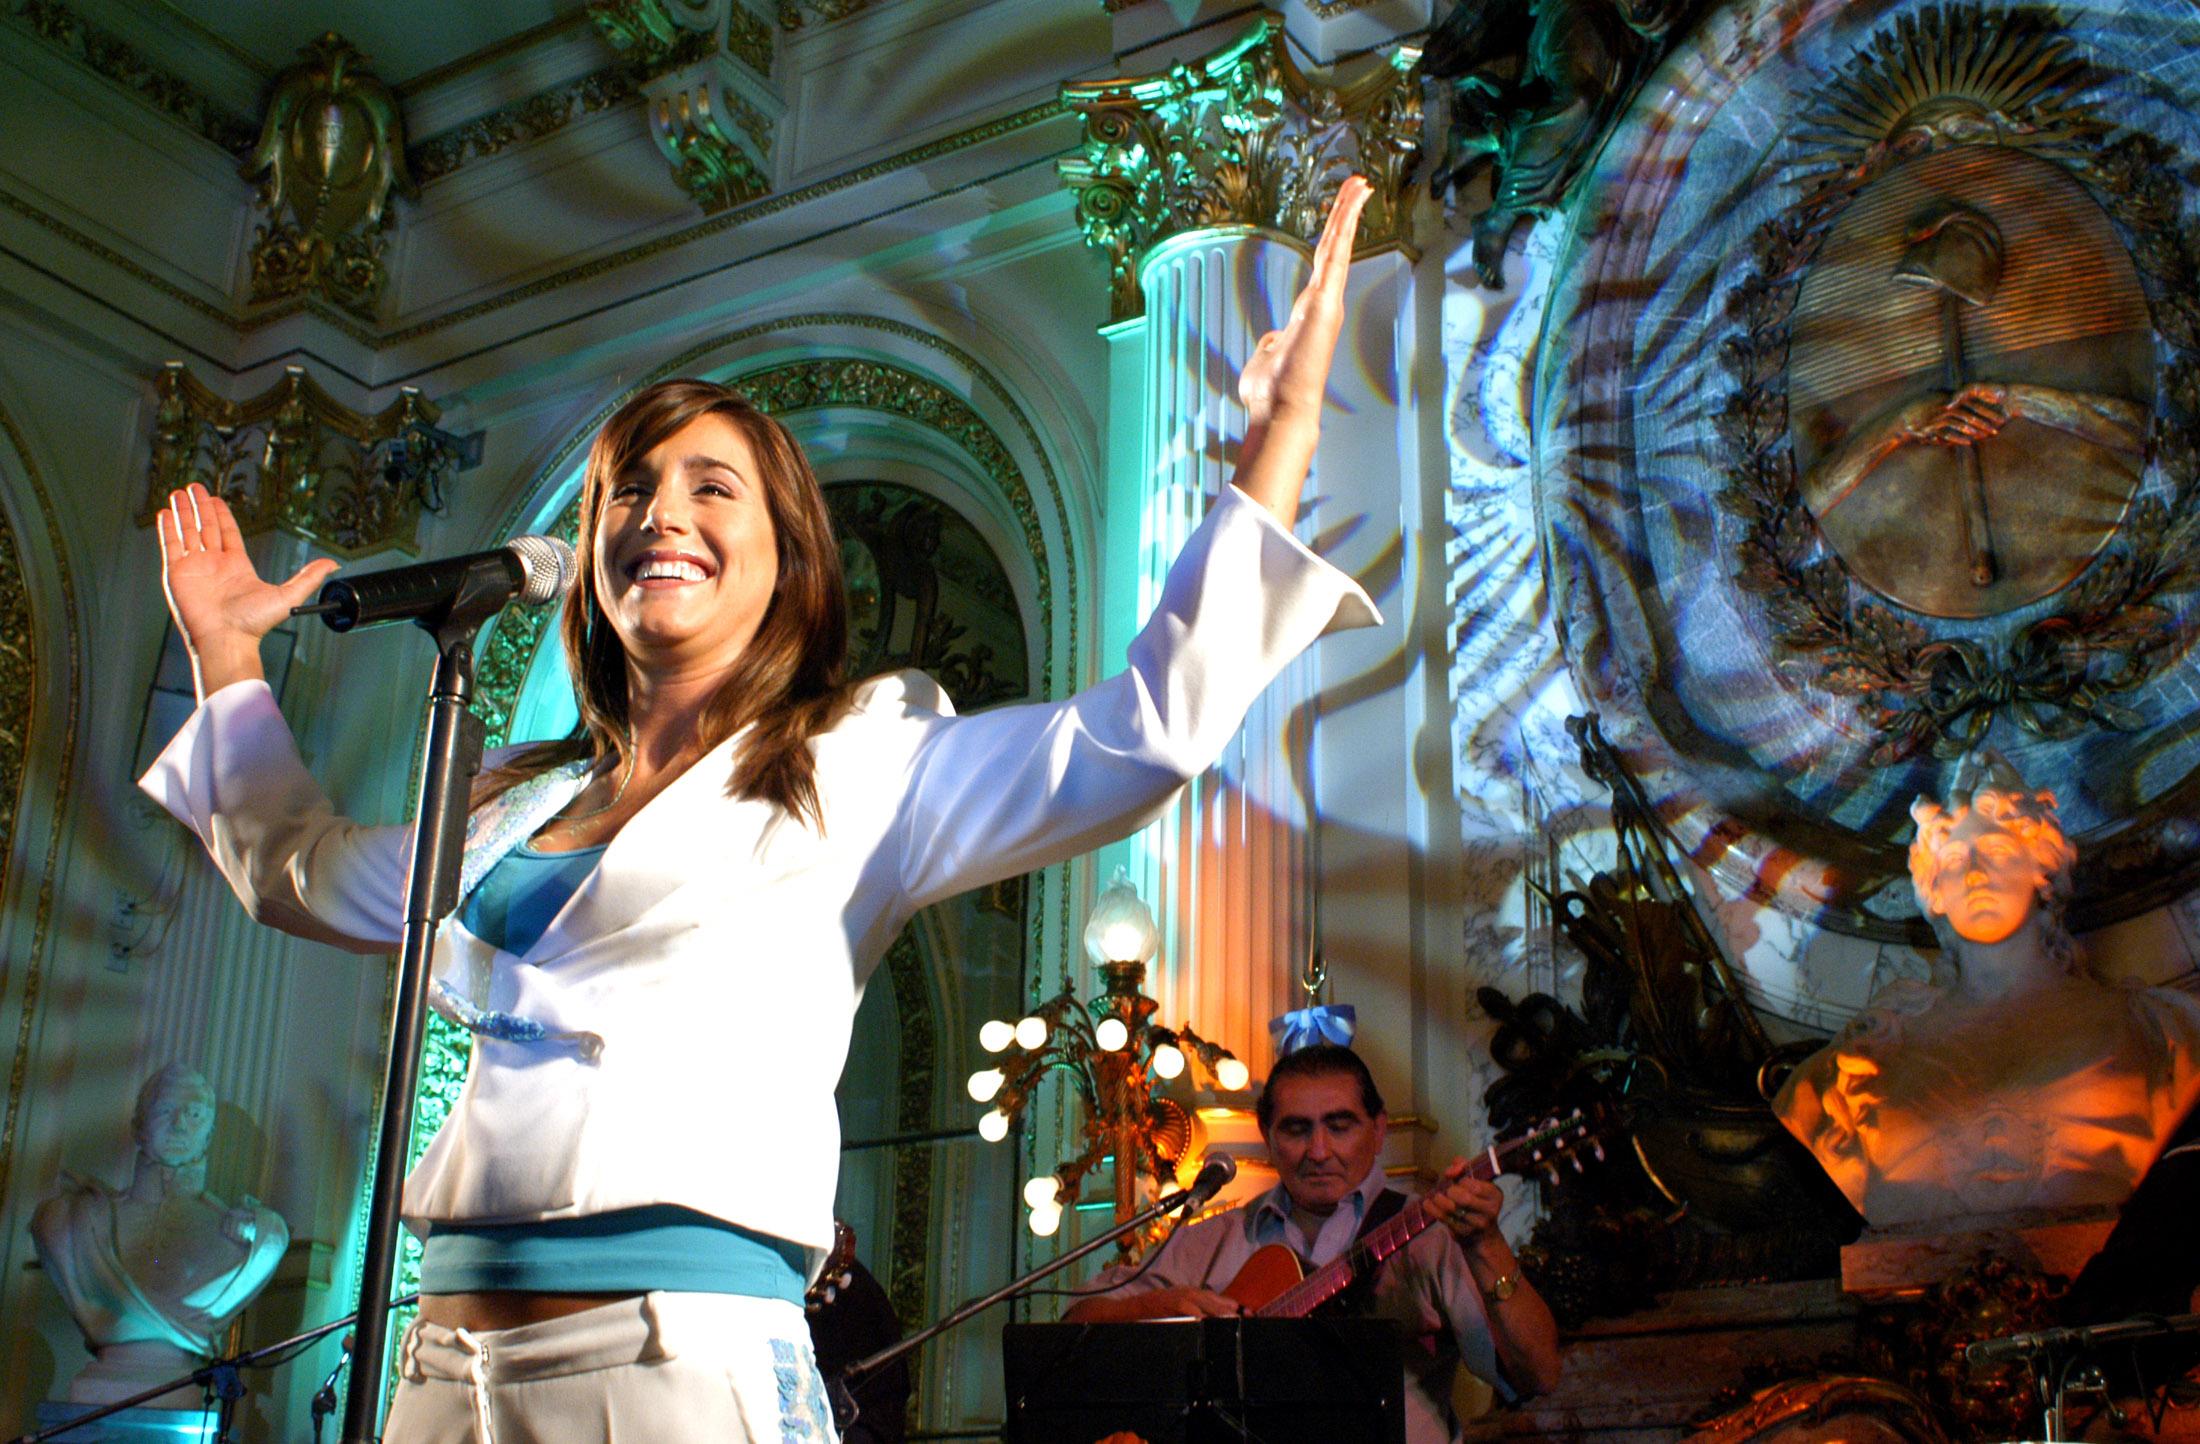 exponentes del folclore latinoamericano